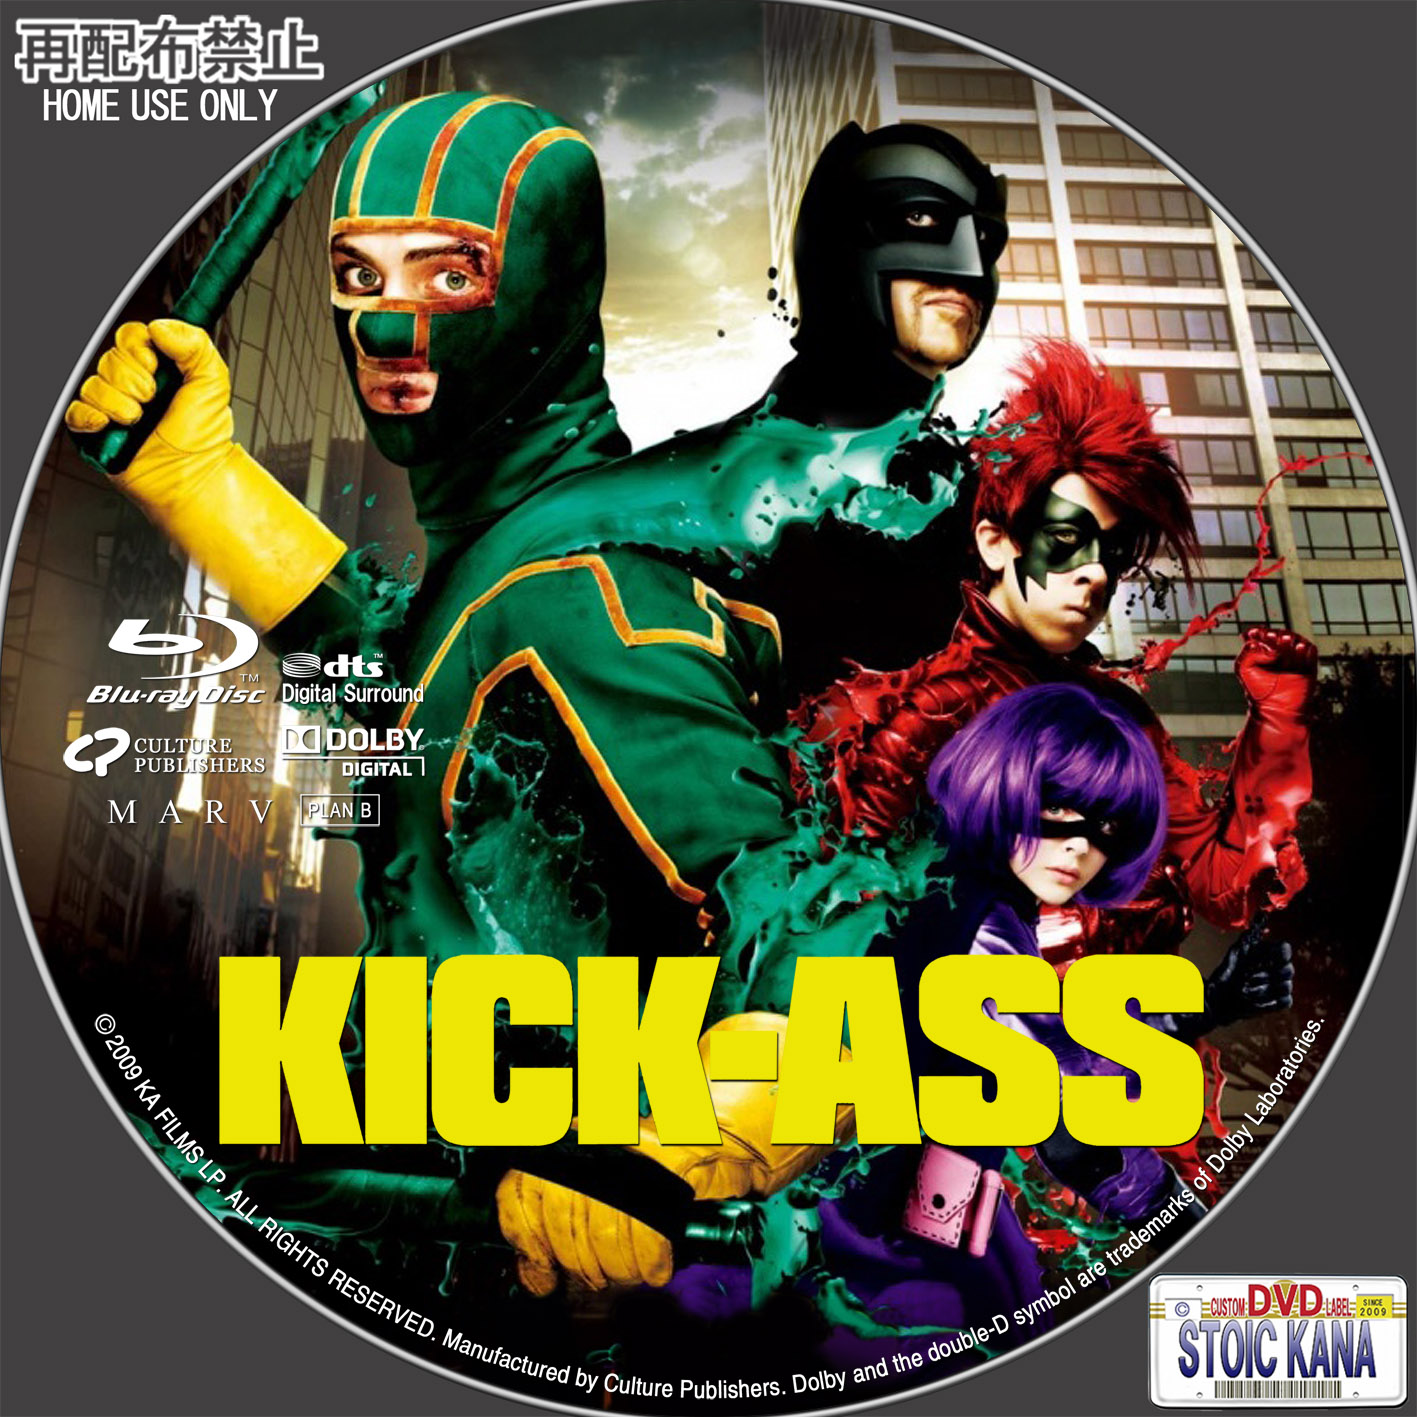 kick ass miracles dvd jpg 422x640